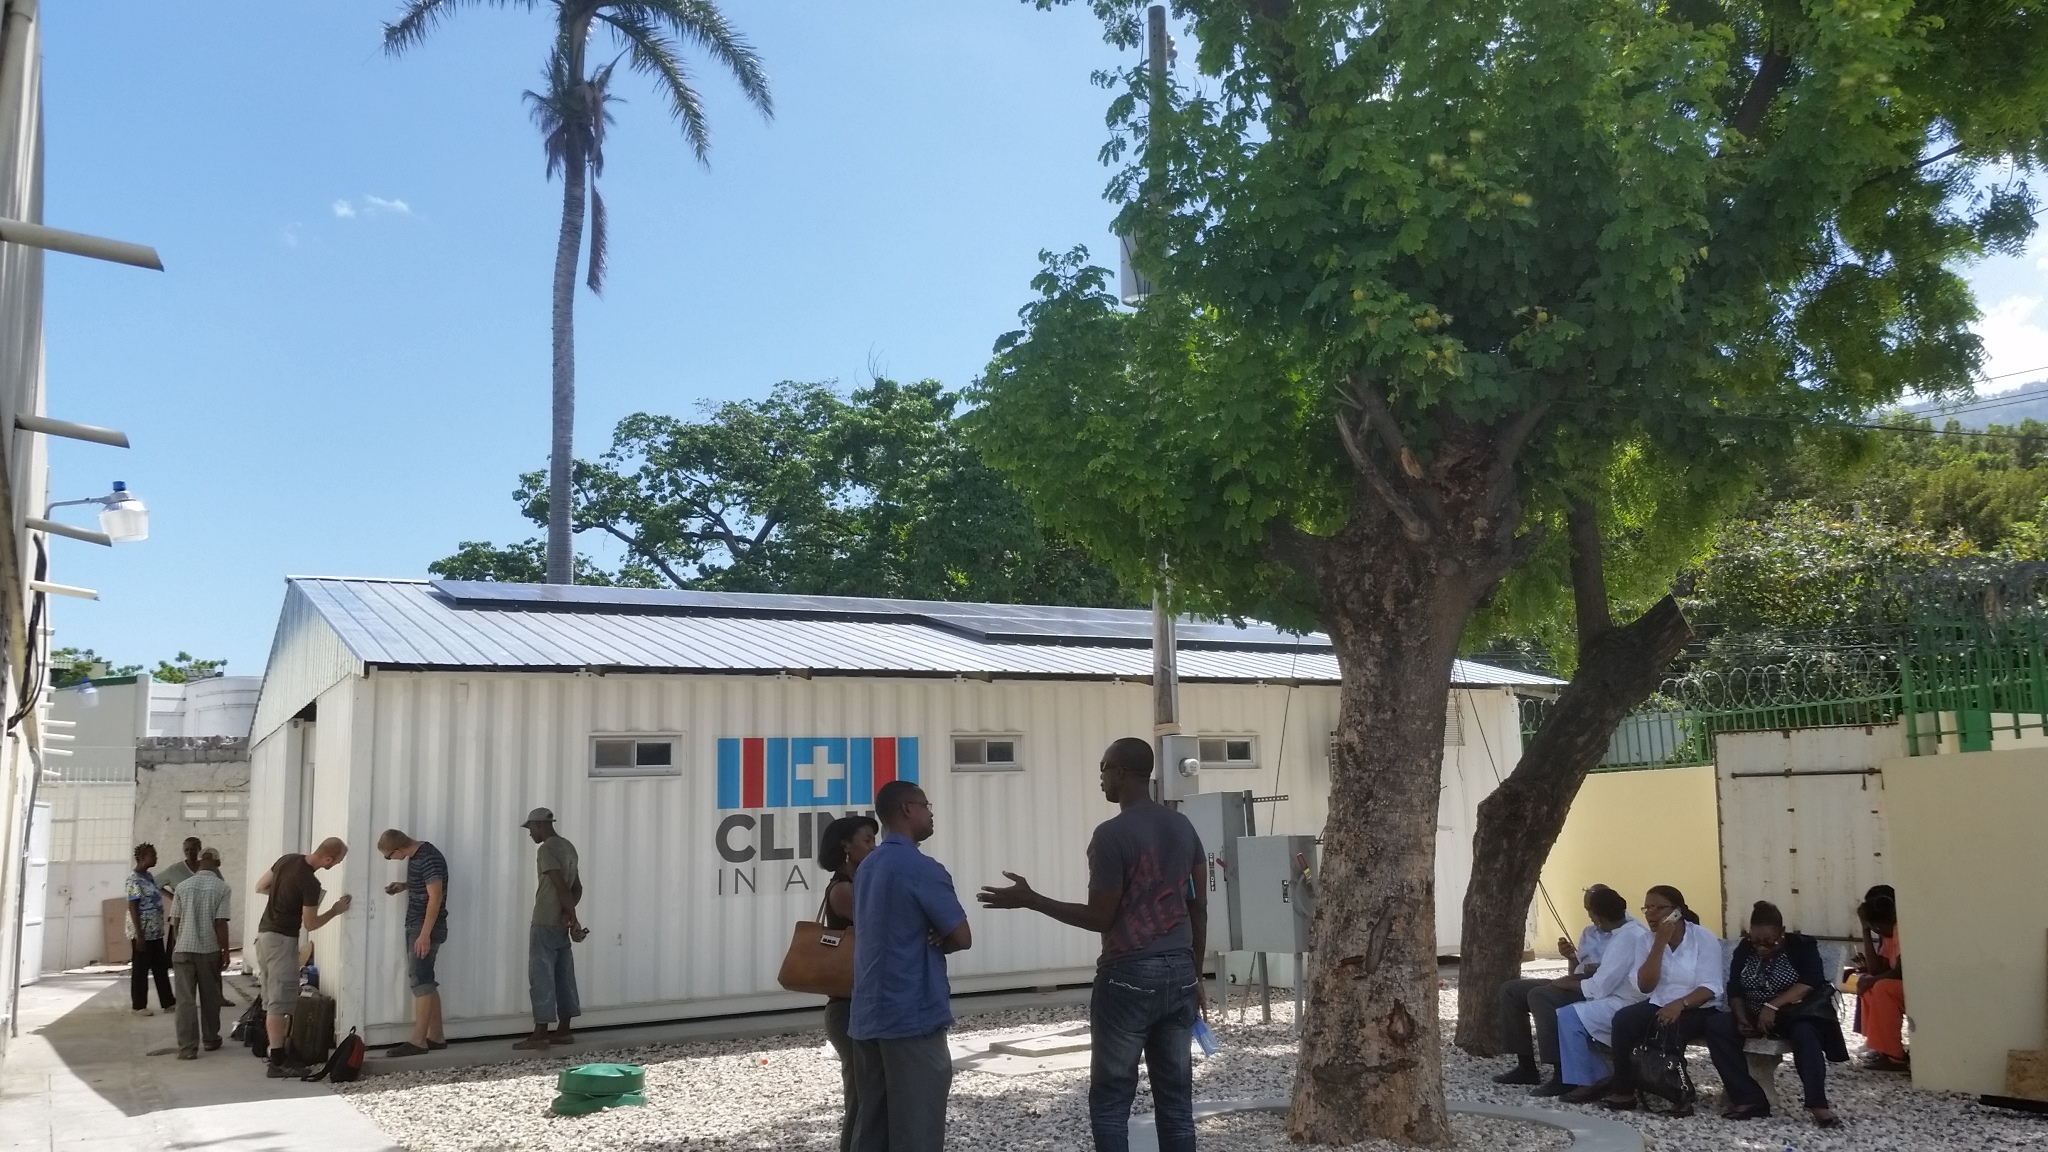 CIAC CBM Haiti Finished Exterior photo 10.20.2015.jpg